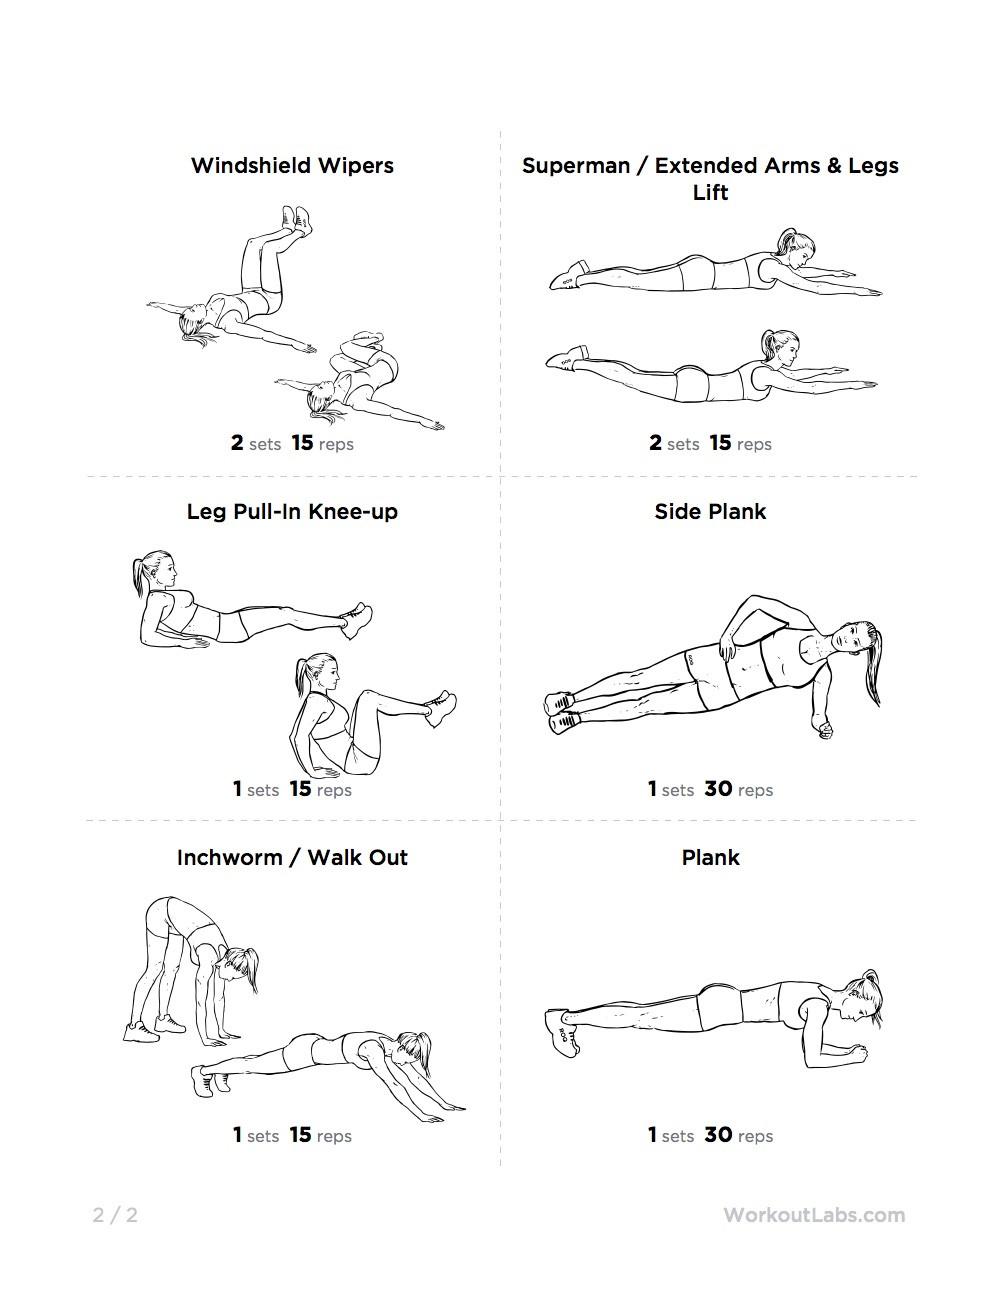 Fat Burning Workout At Home Flat Stomach  Flat Stomach Belly Fat Blaster at Home Workout for Men & Women